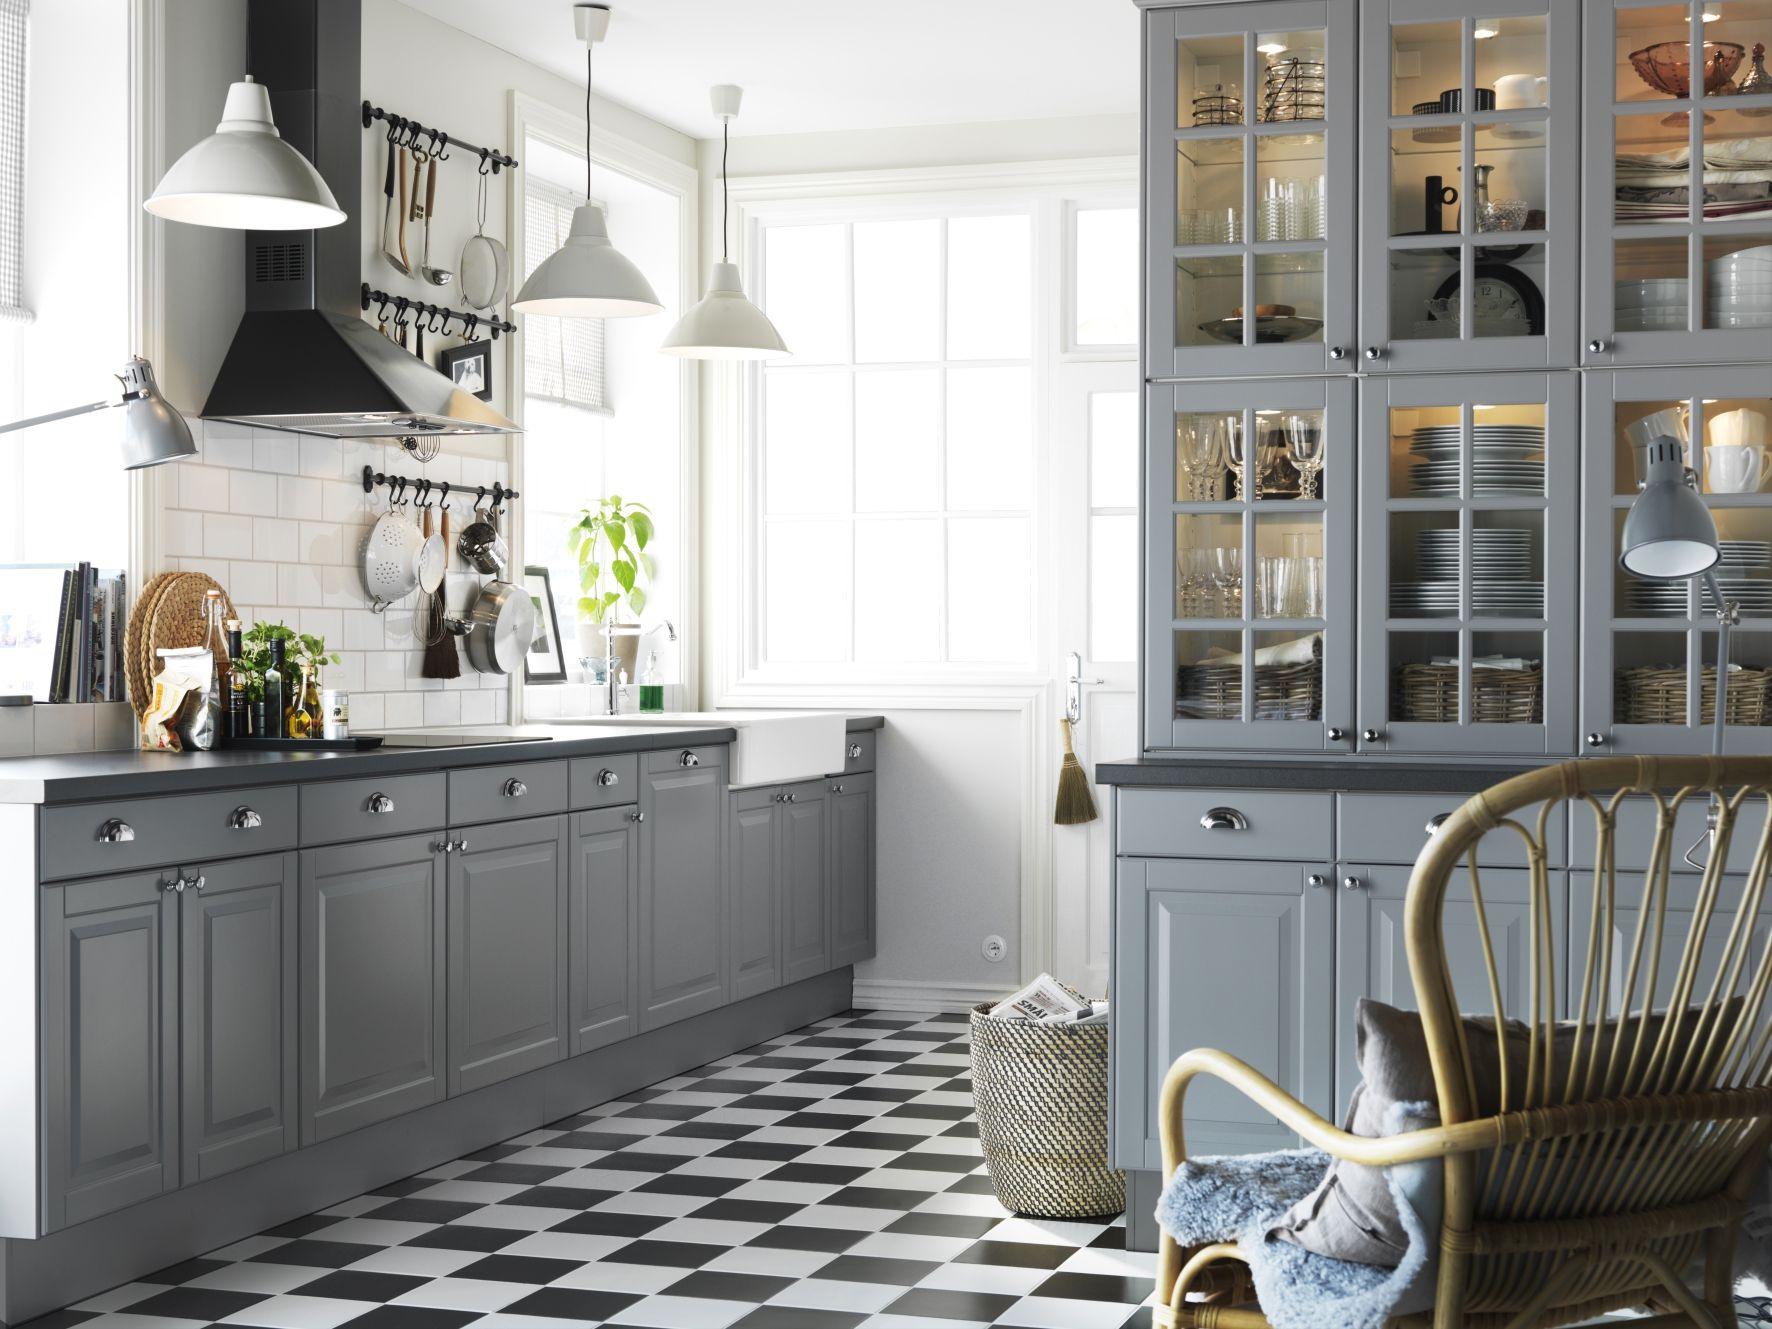 Rbki19a: top contemporary design kitchen cabinets ikea ...